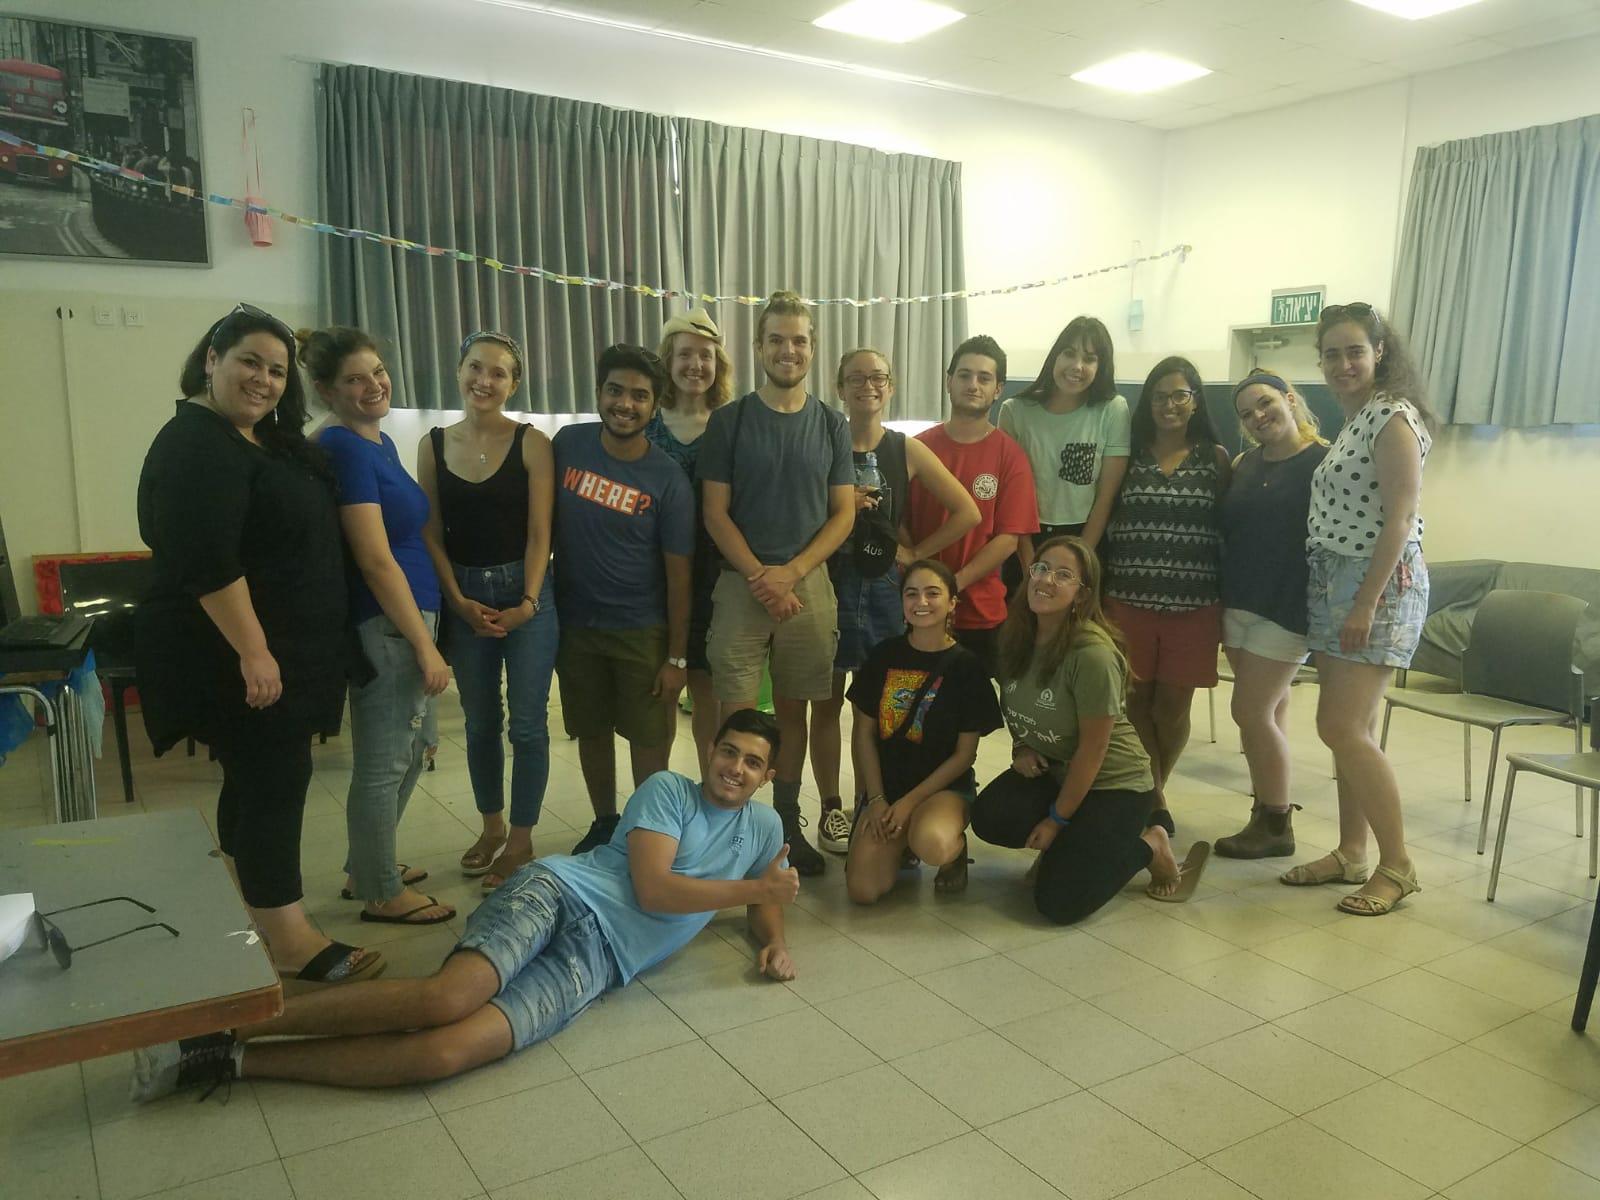 Yahel Fellows in Matnas; Rishon Lezion